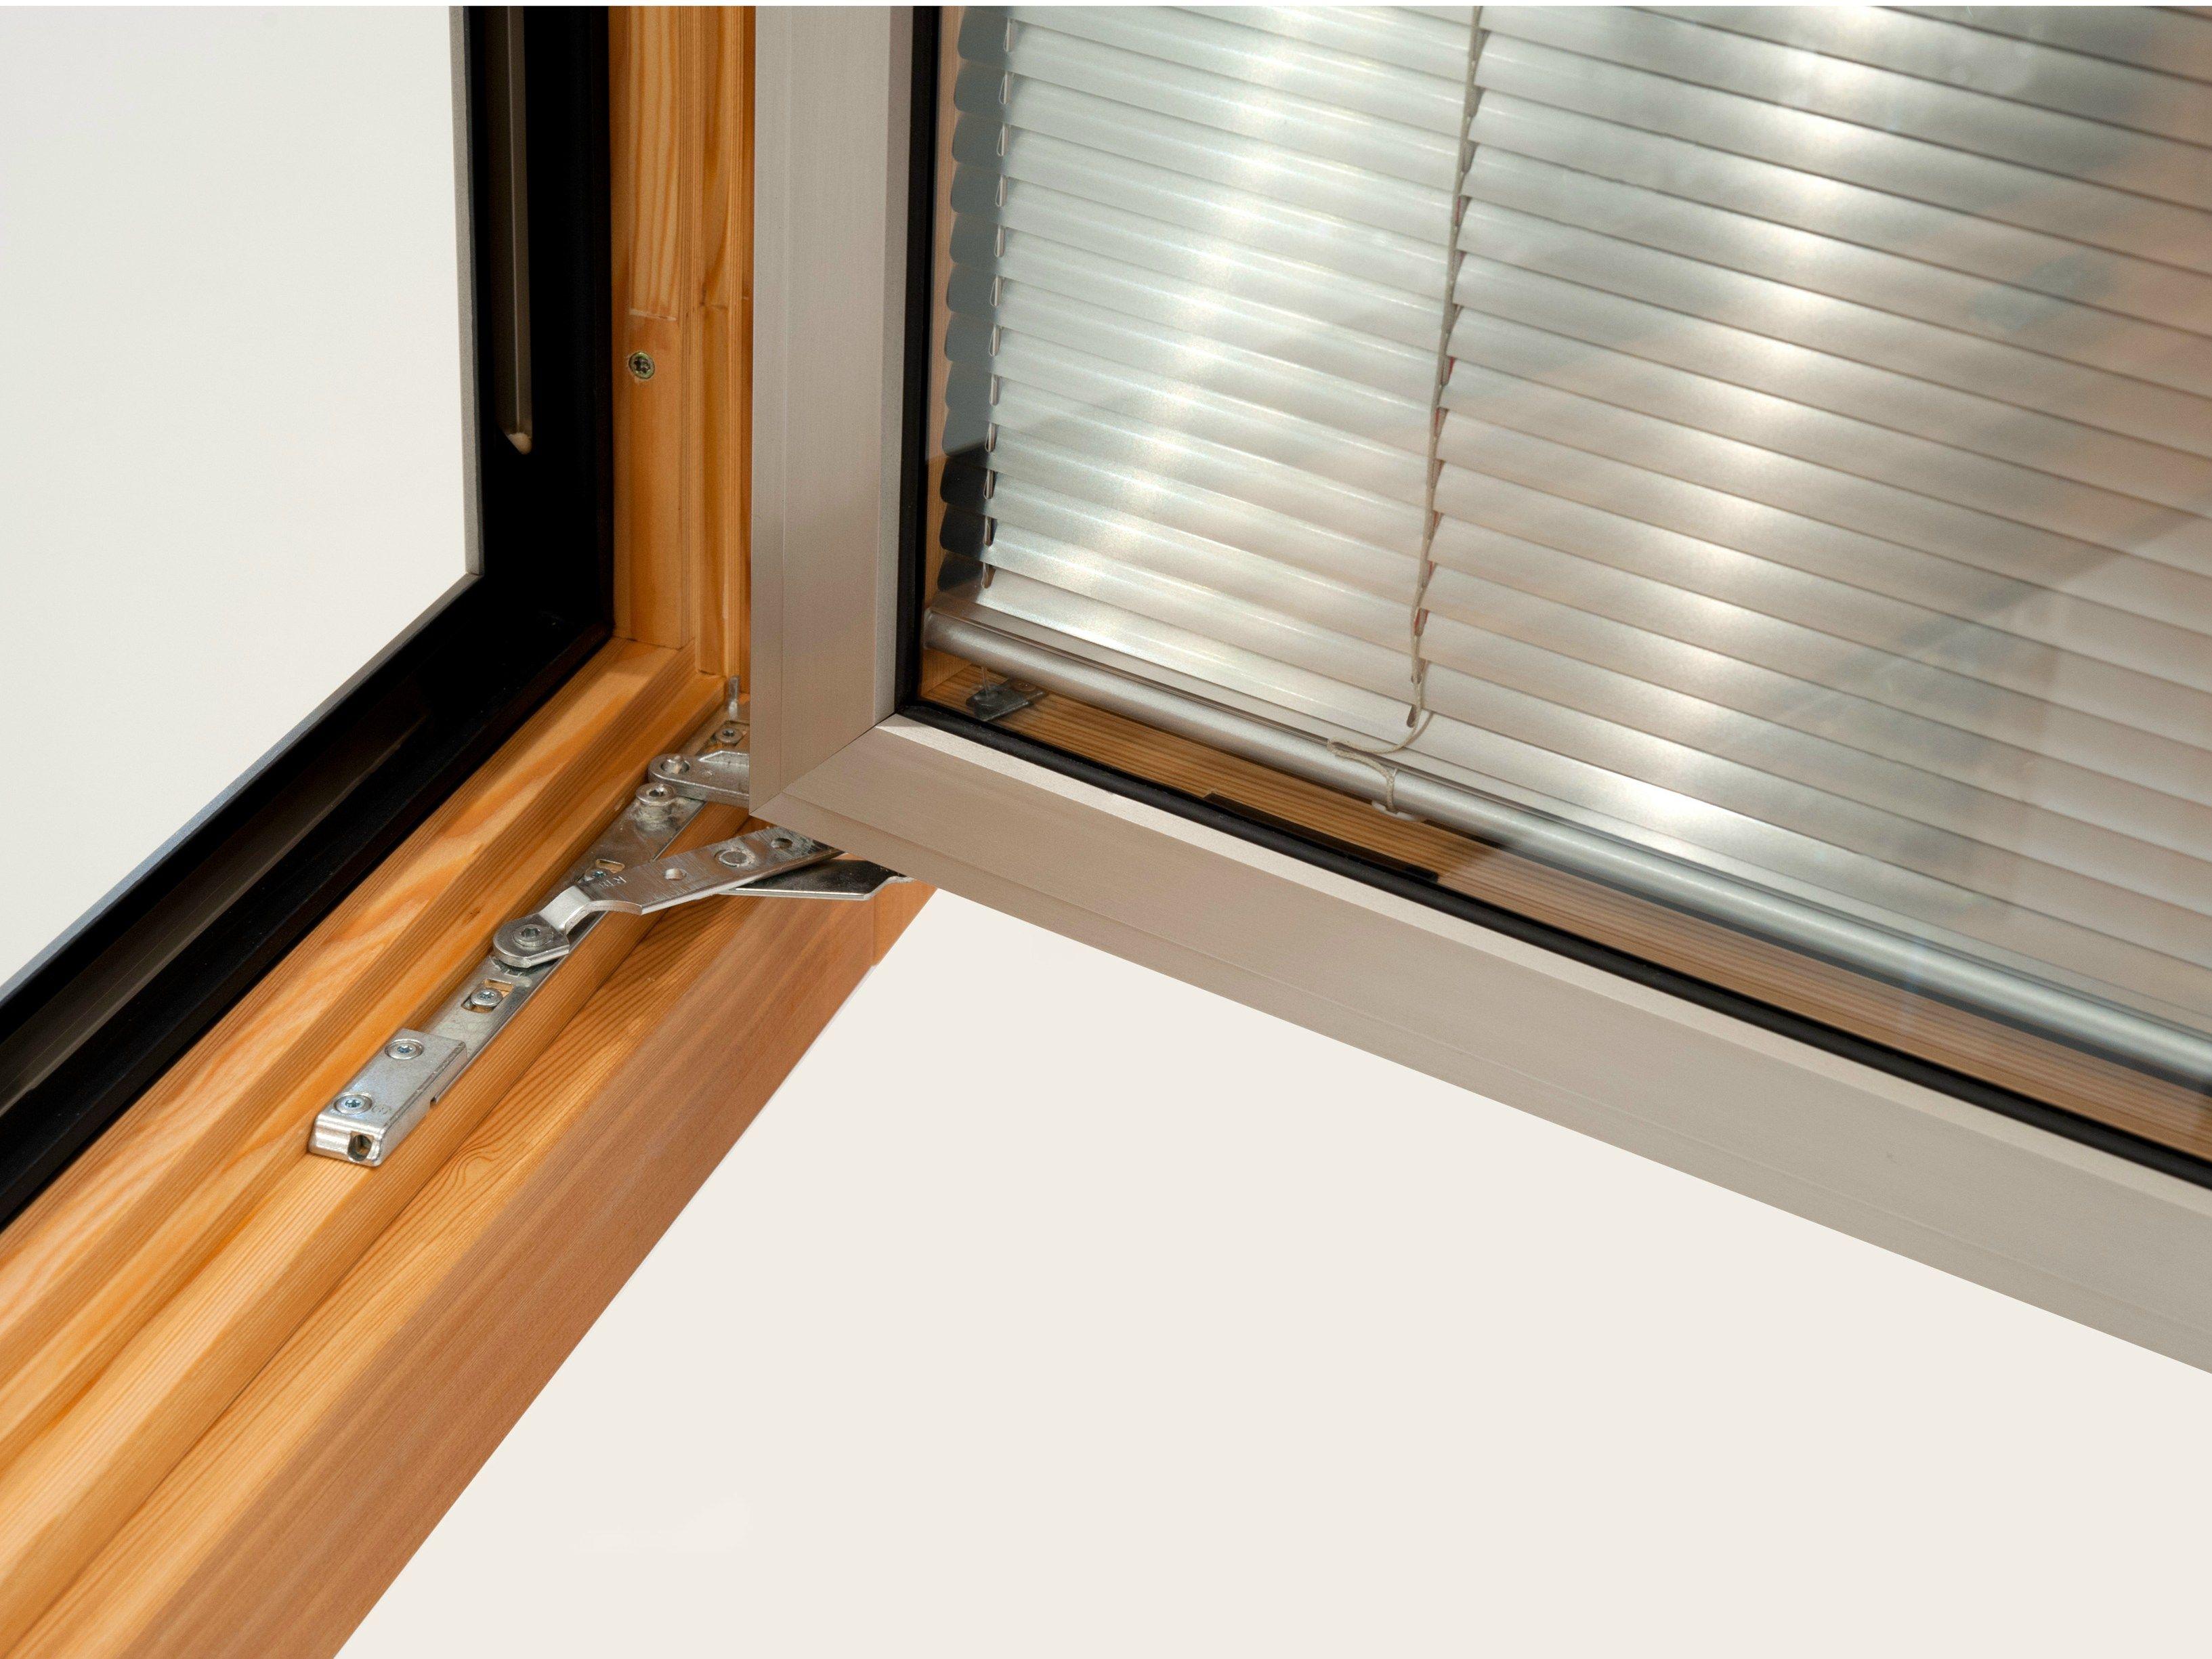 #794618 invólucro janelas janelas janelas de alumínio madeira 918 Onde Comprar Janelas De Aluminio Em Curitiba